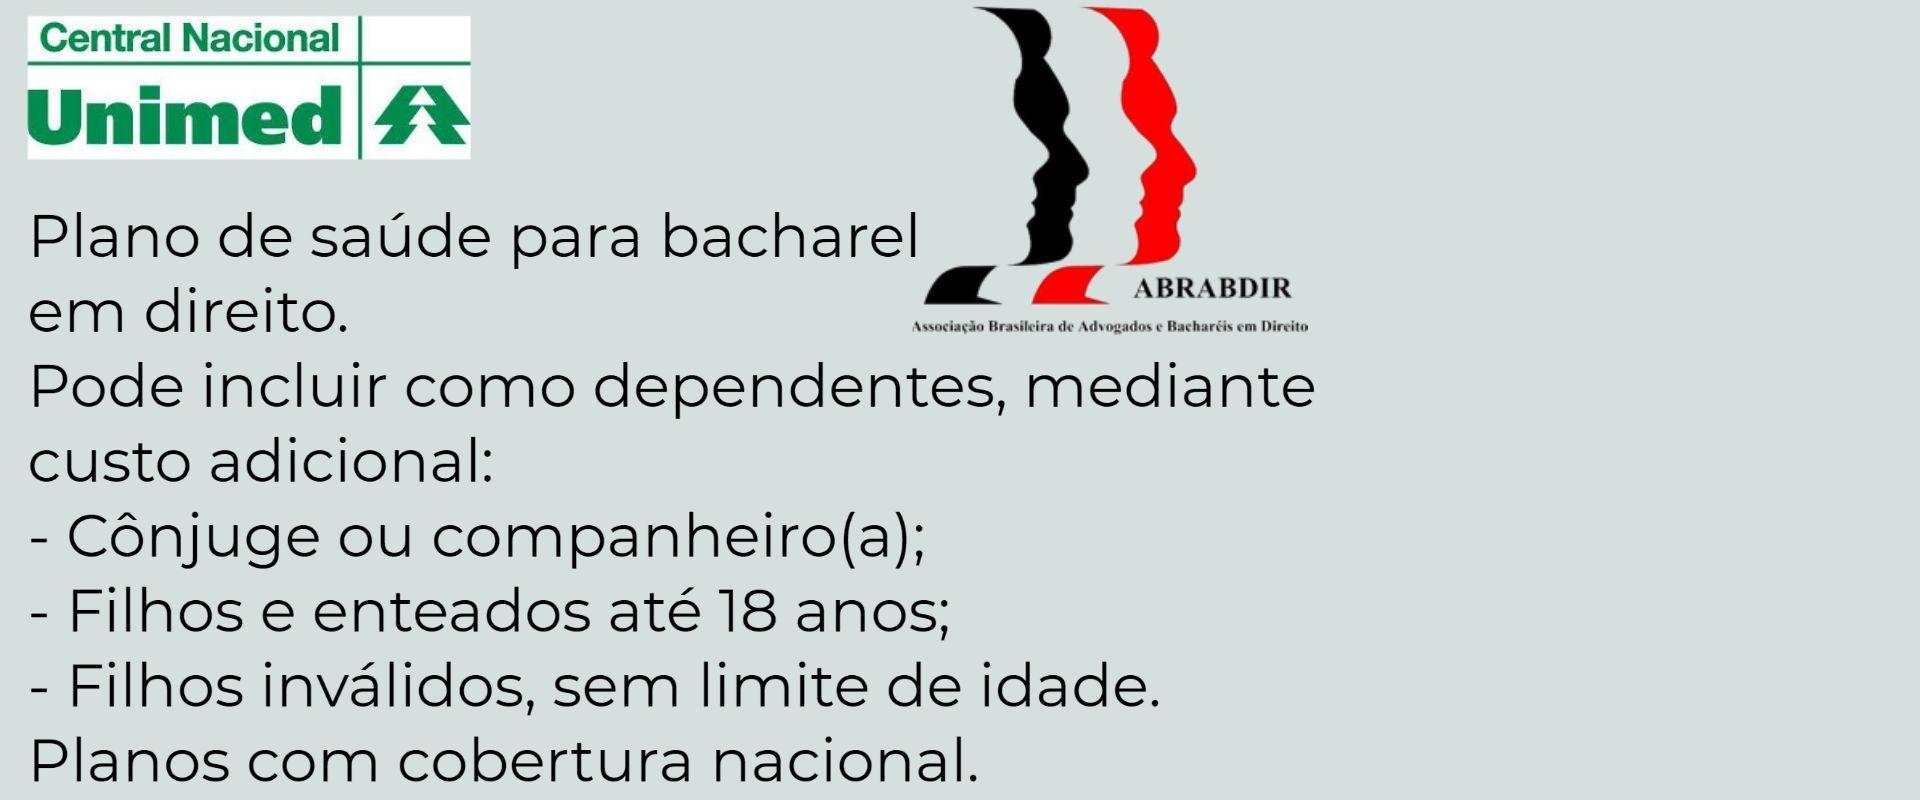 Unimed ABRABDIR Bebedouro